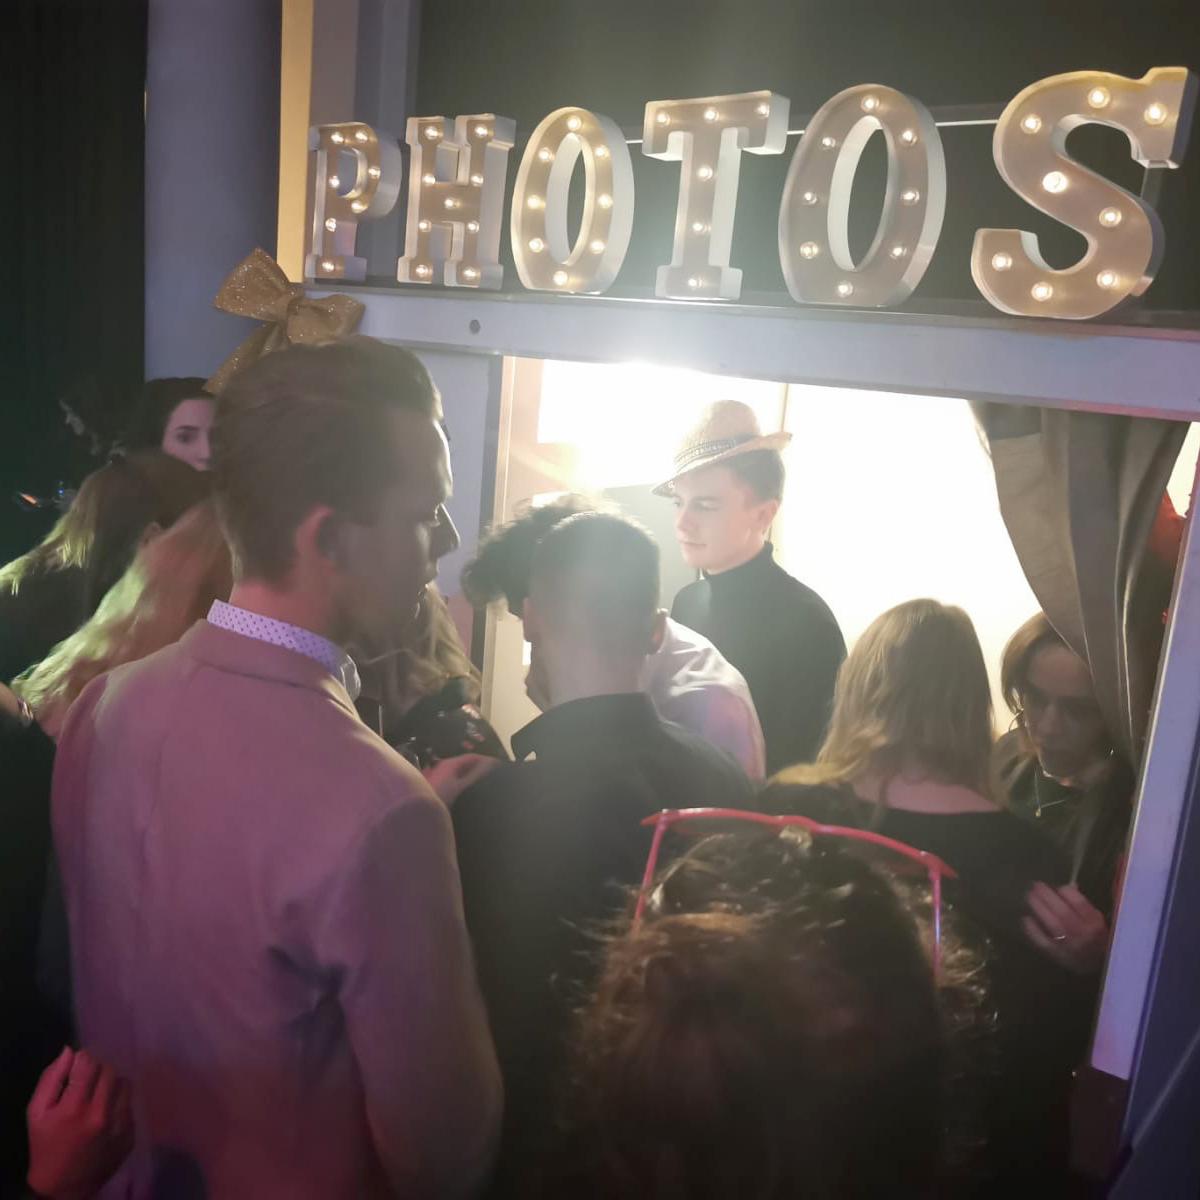 Zakelijk borrel photobooth bedrijfsfeest